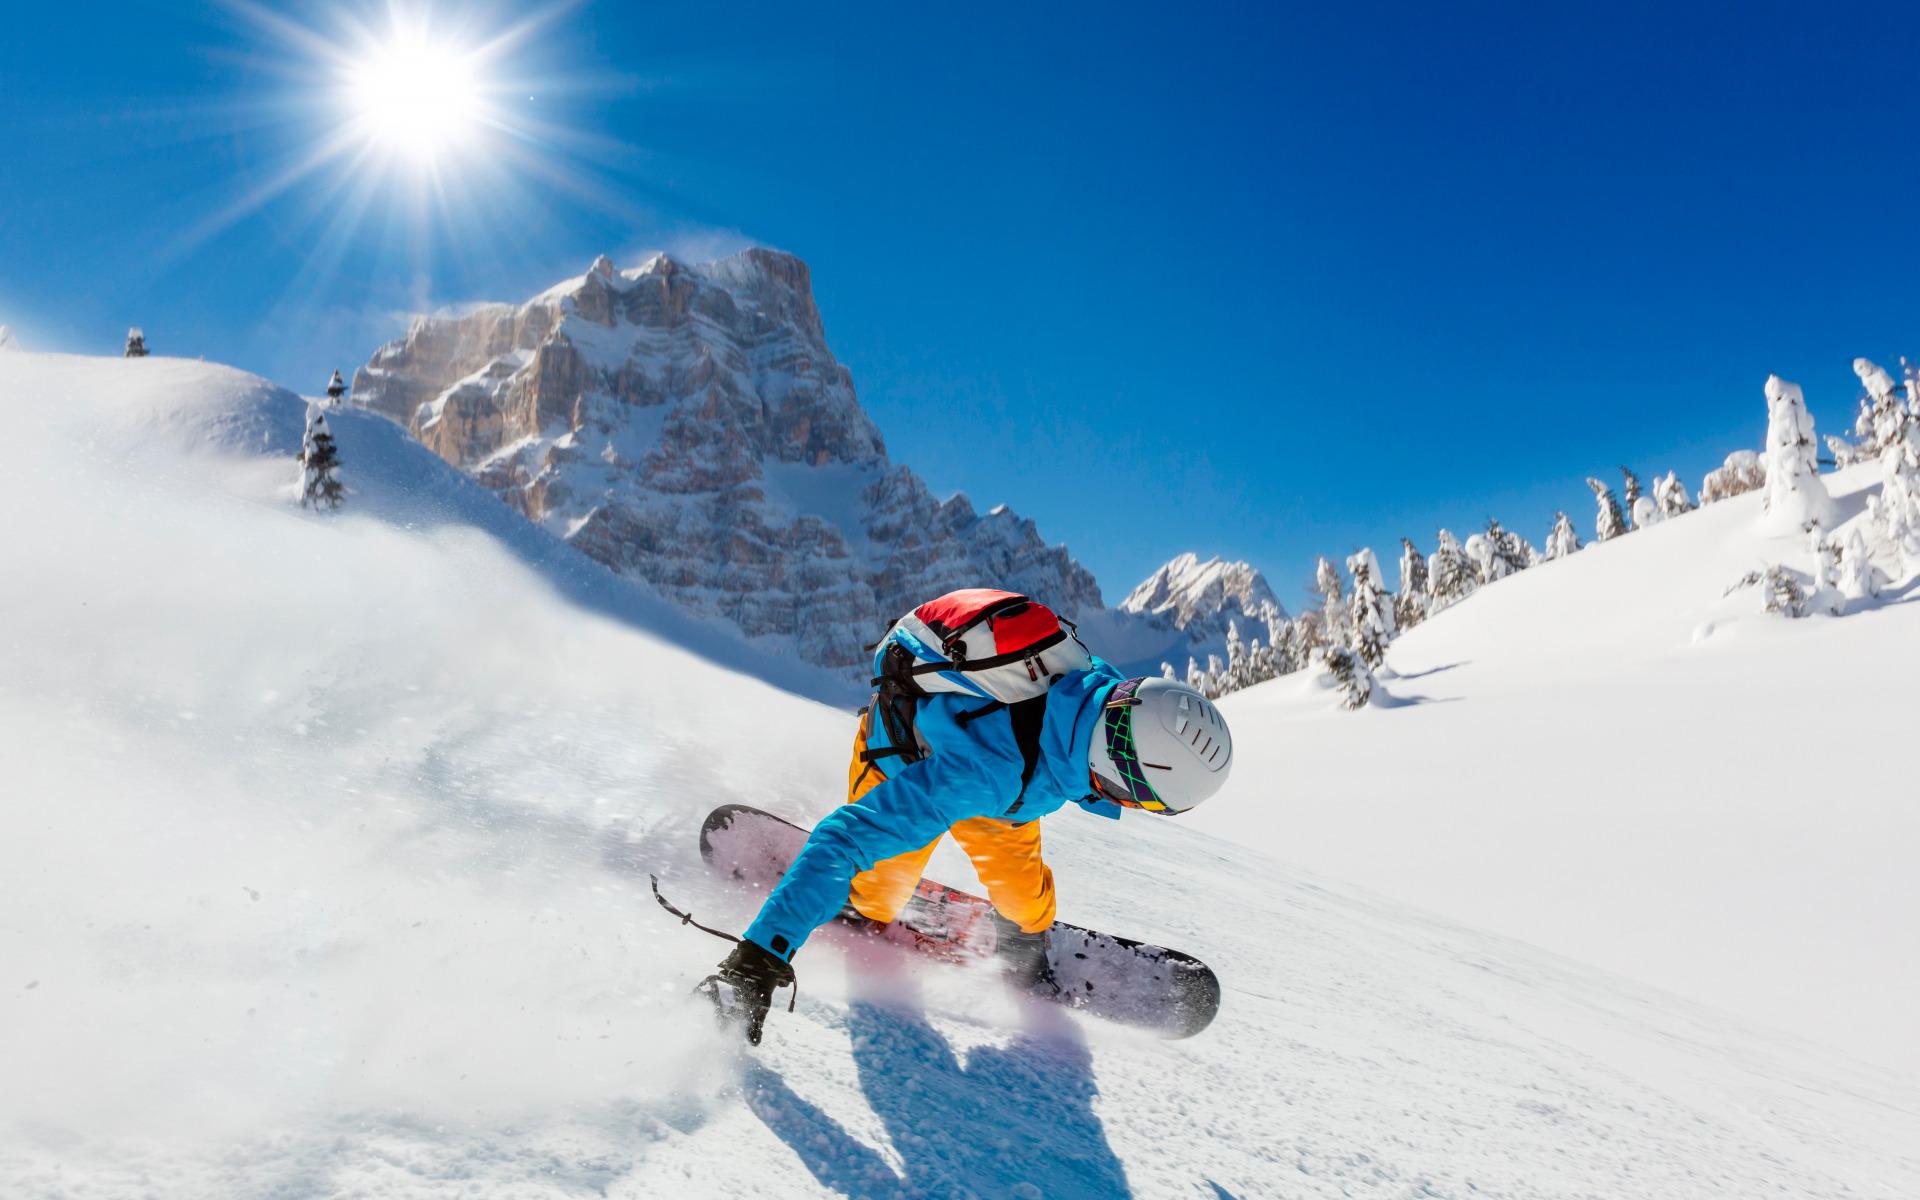 сноубордист вираж снег солнце  № 3559585 бесплатно